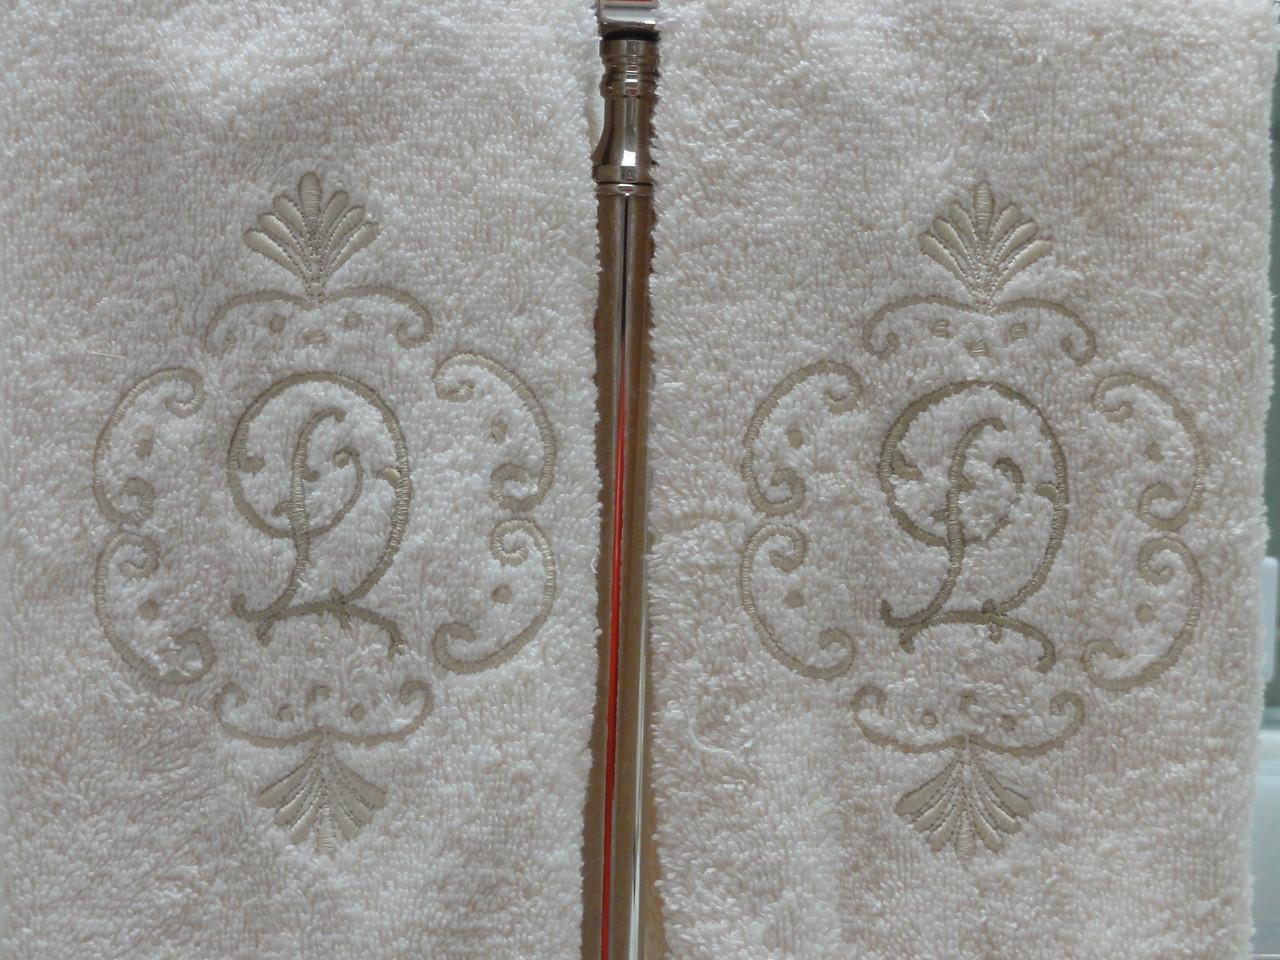 Closeup of monogram